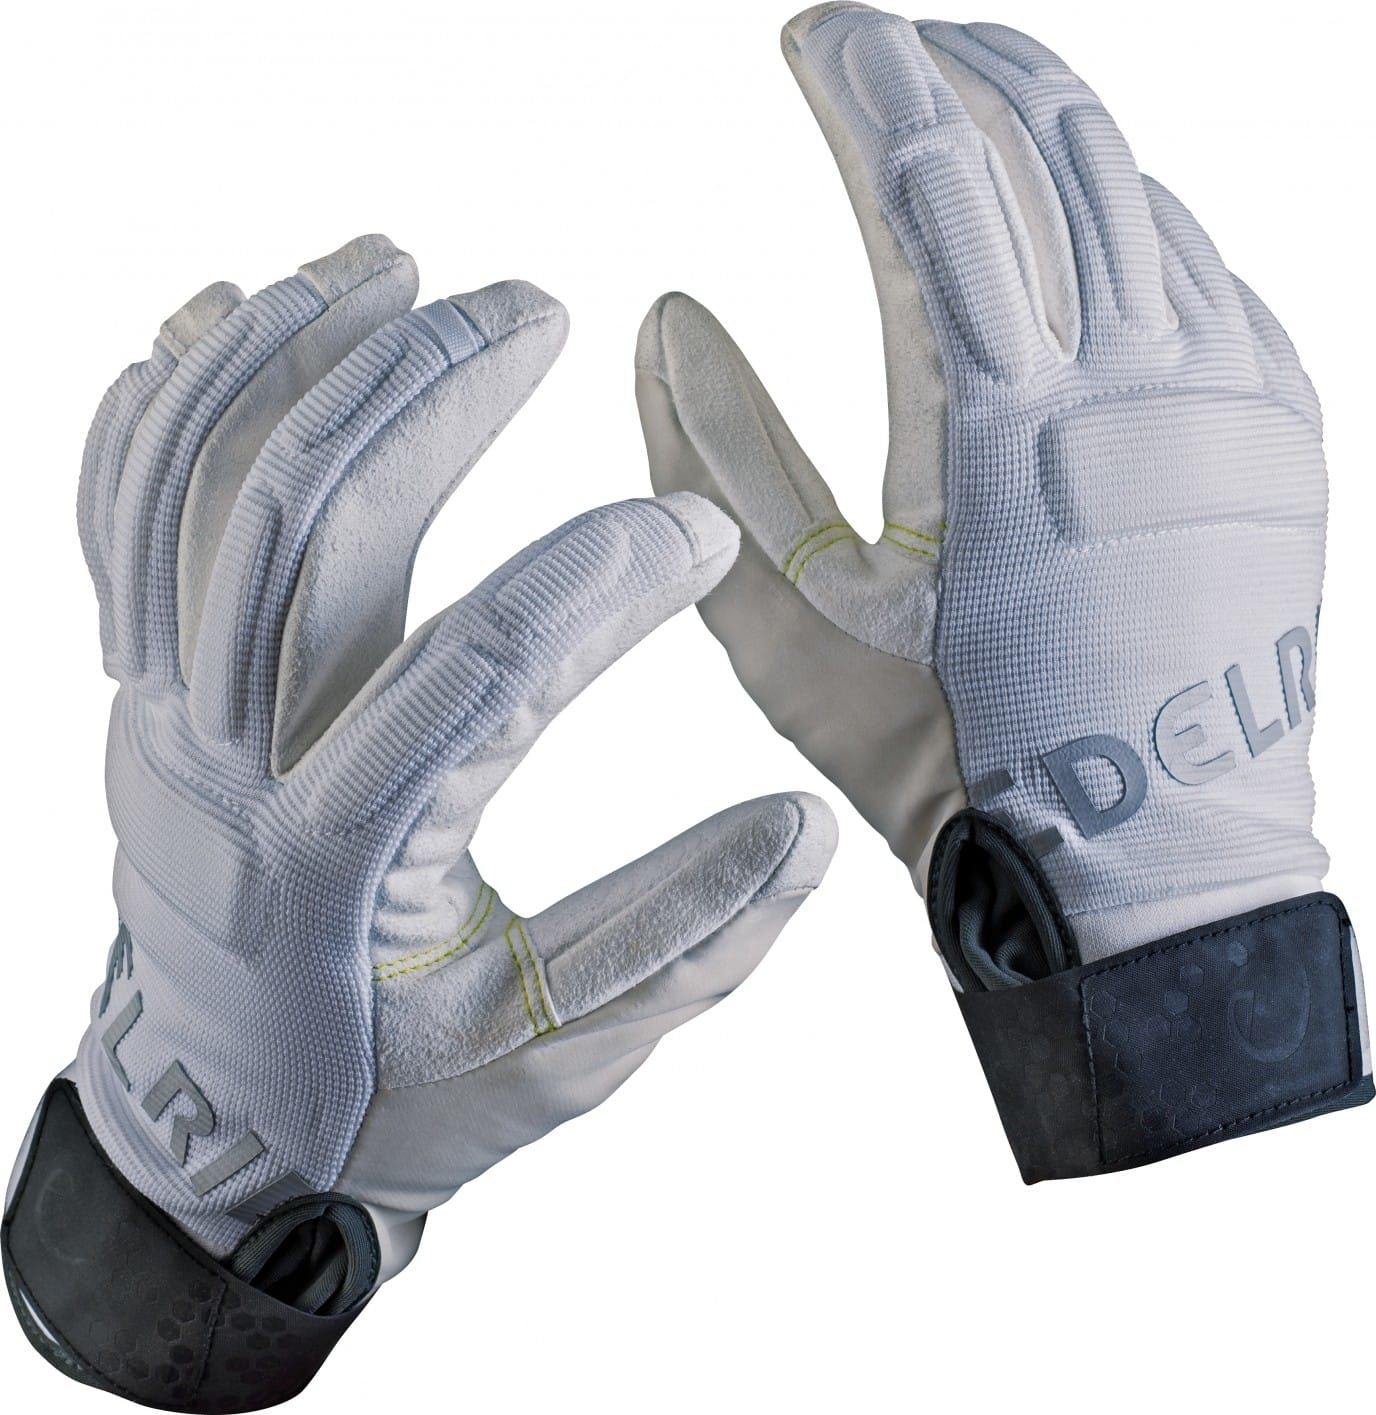 Edelrid Sticky Gloves   Größe XS,S,M,L    Fingerhandschuh